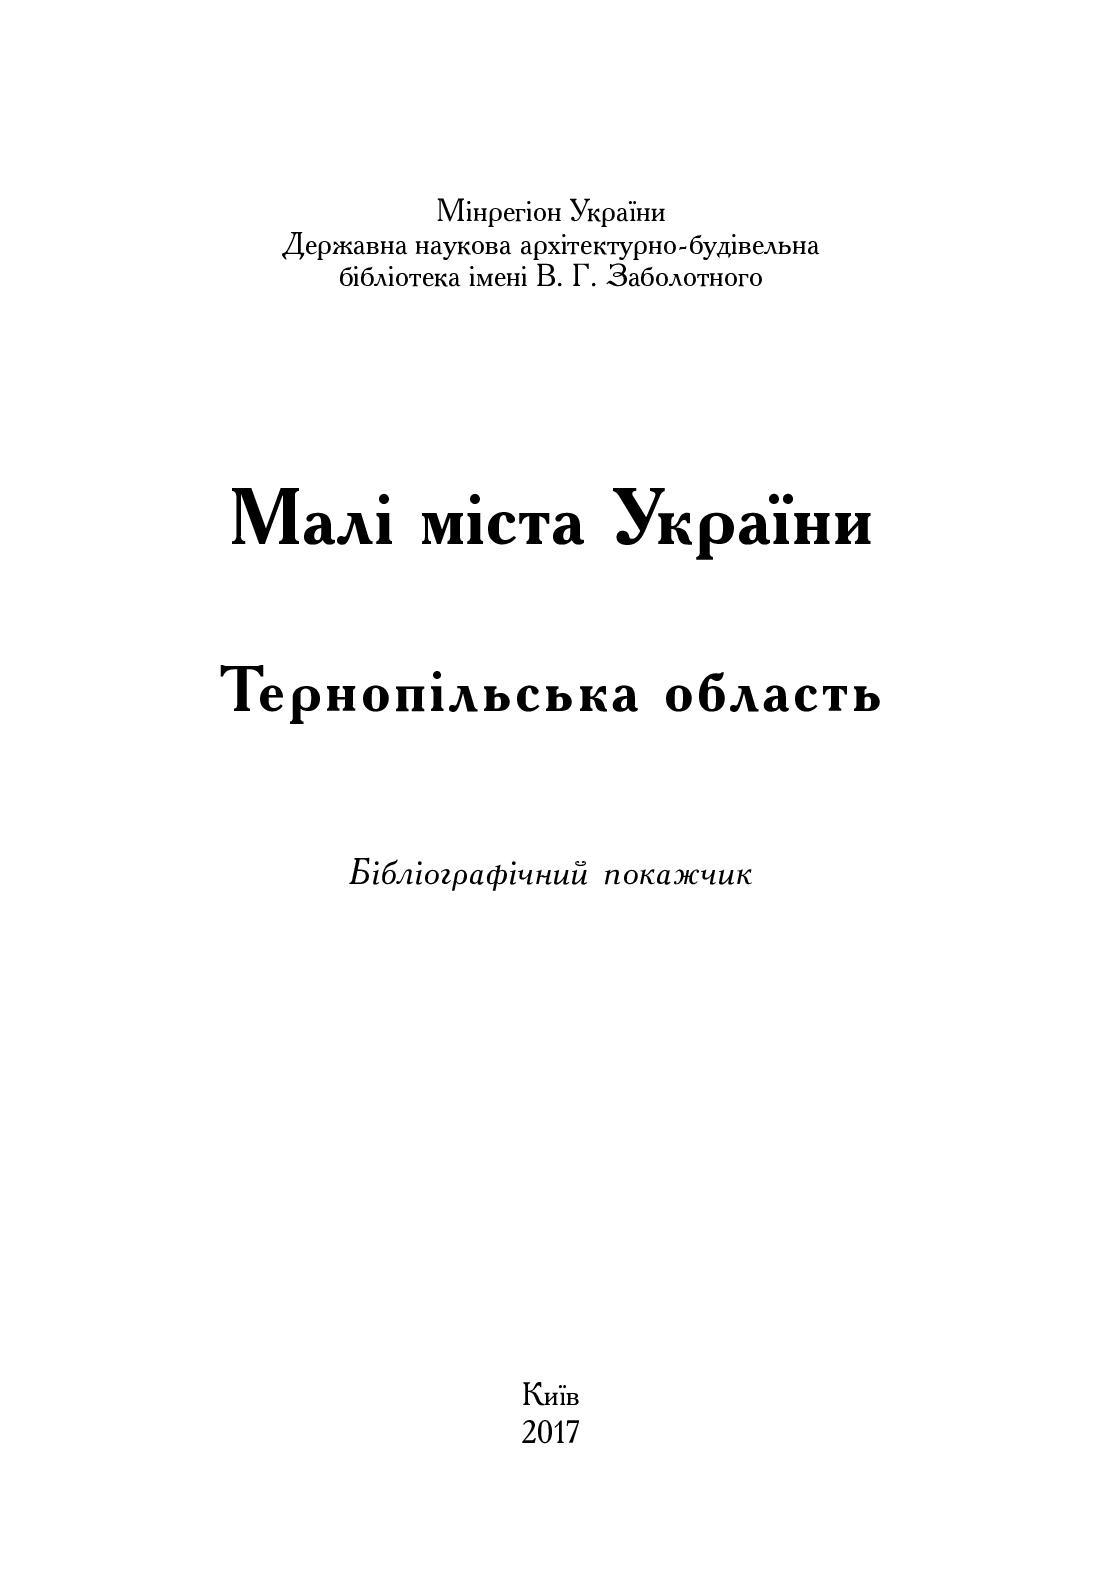 Тернопільська область Part1